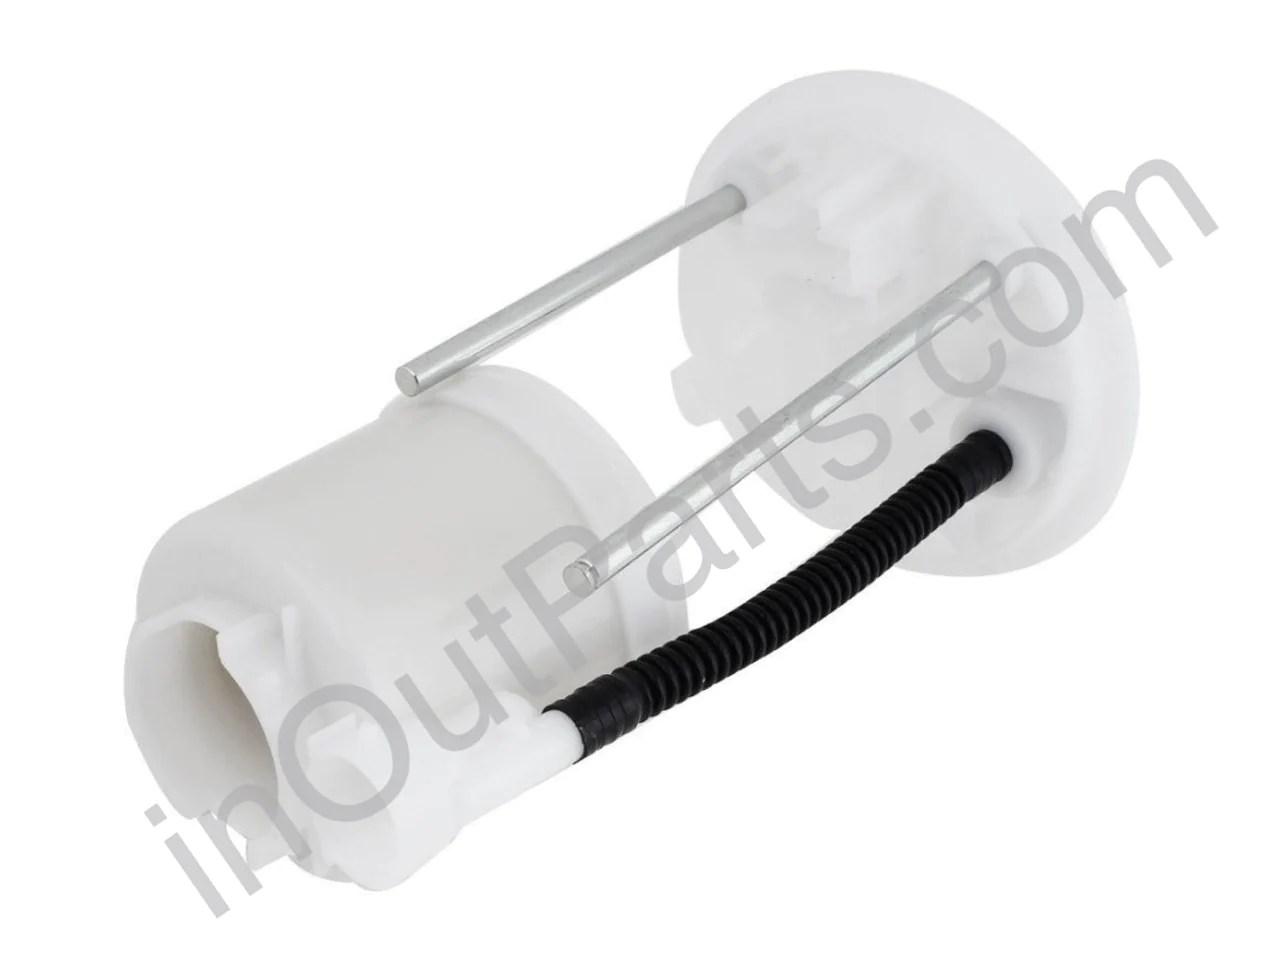 medium resolution of  fuel filter toyota camry 2azfe 2006 2007 2008 2009 2010 2011 2012 2013 2014 2015 2016